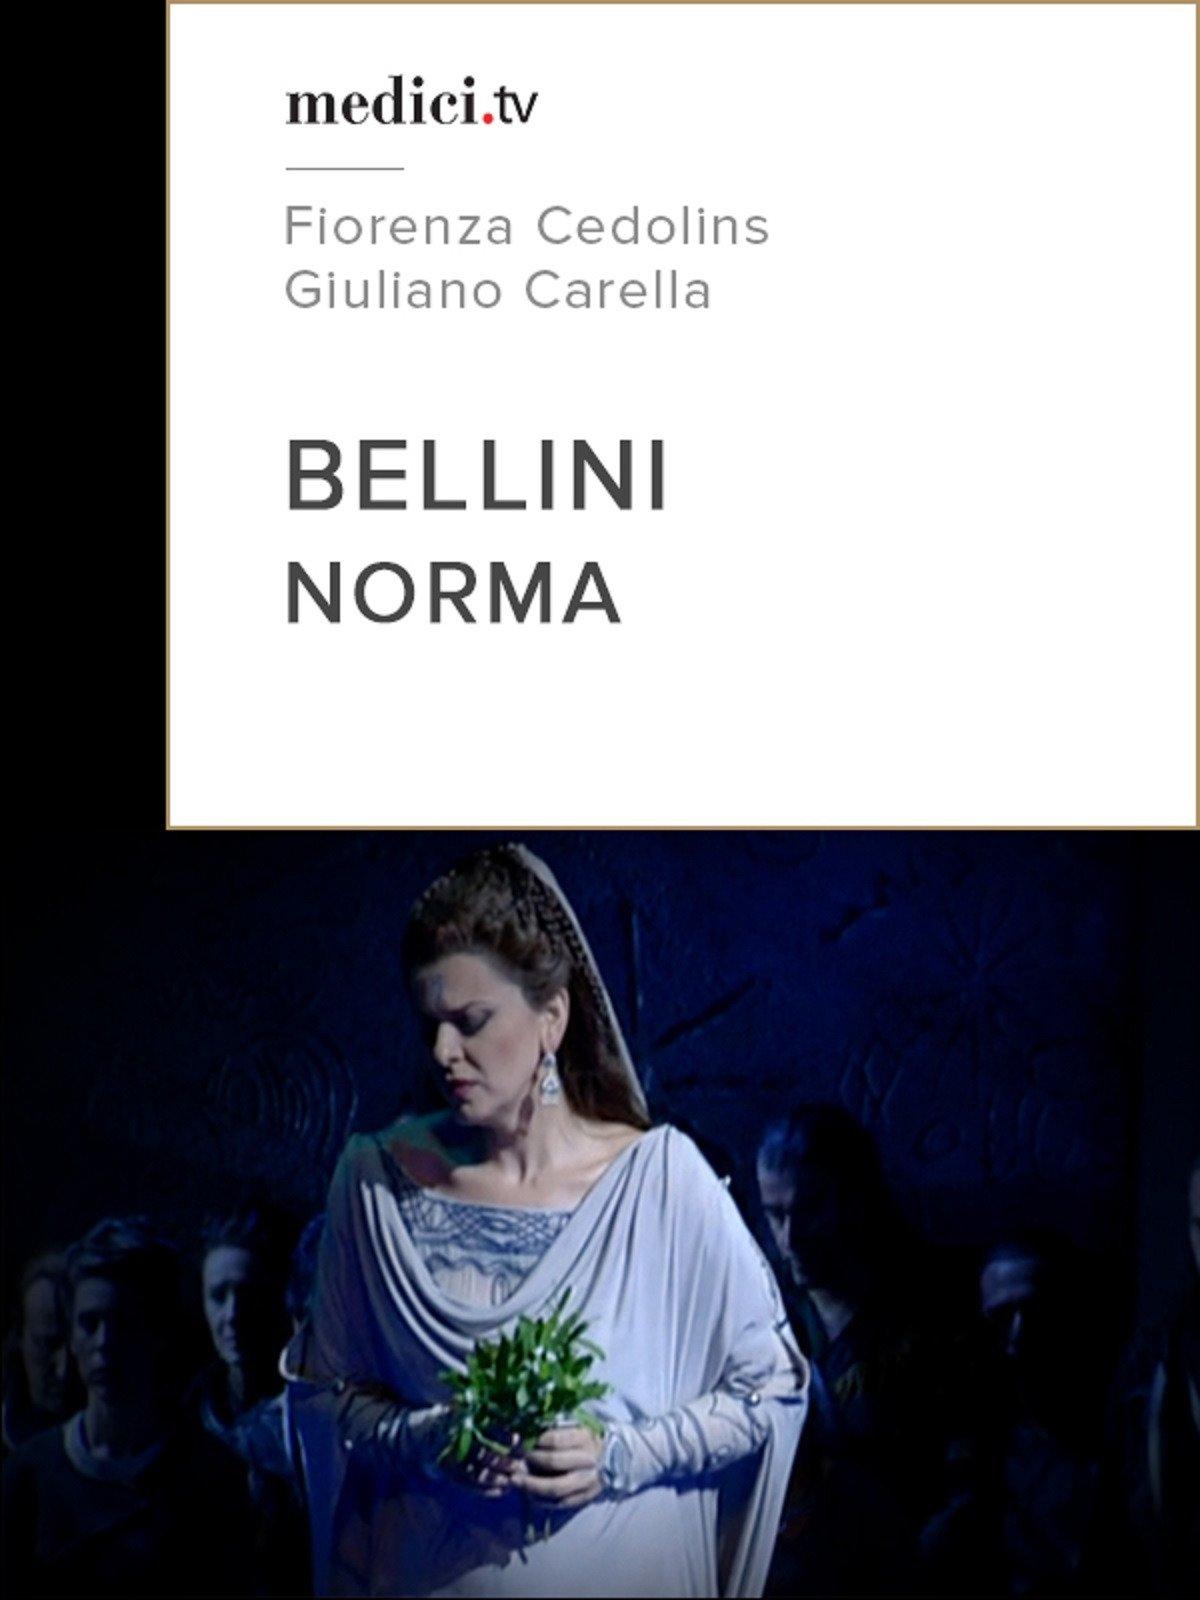 Bellini, Norma